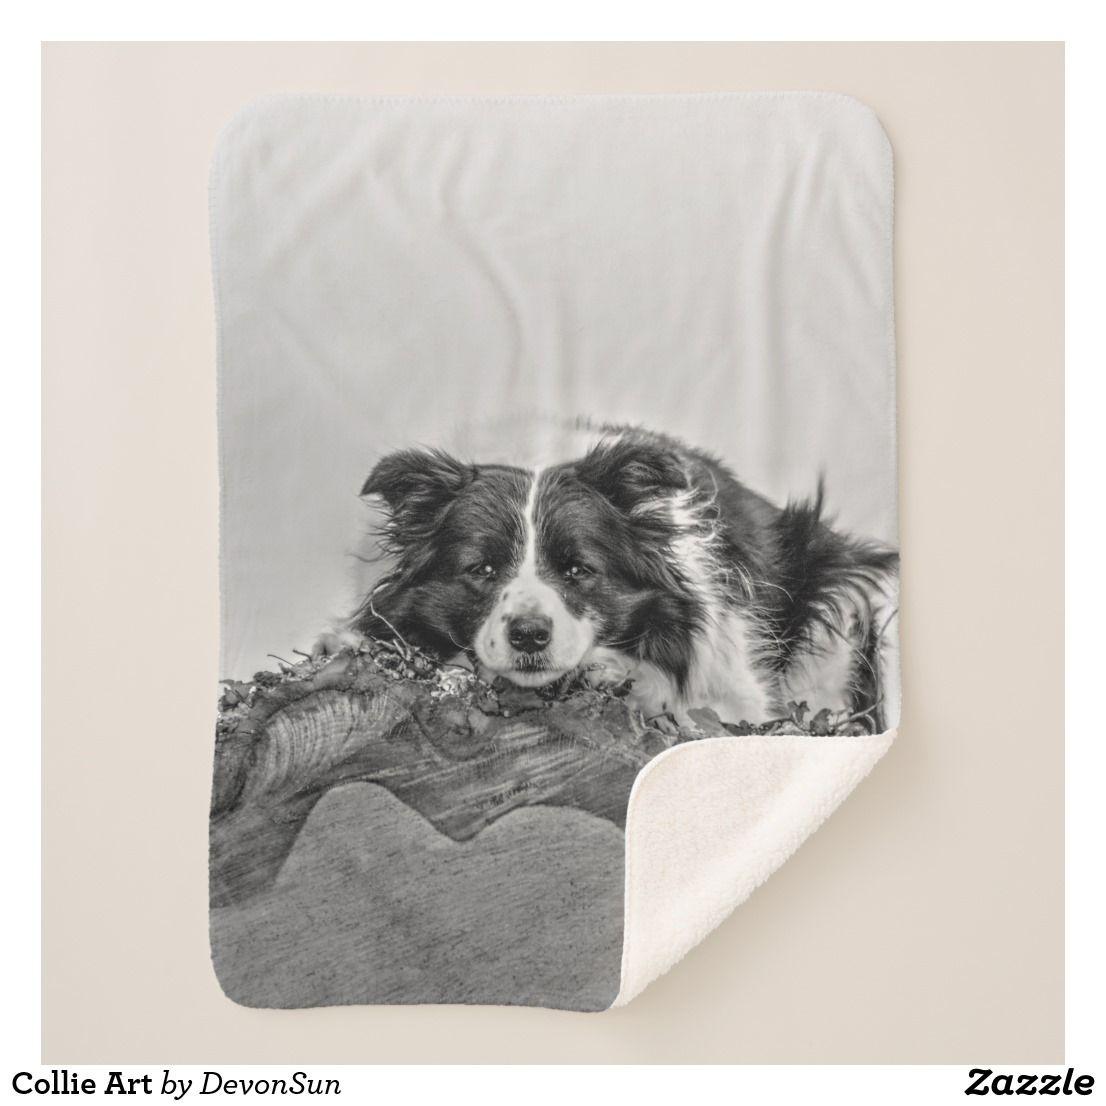 Collie Art Sherpa Blanket Zazzle Co Uk Collie Dog Lovers Blanket